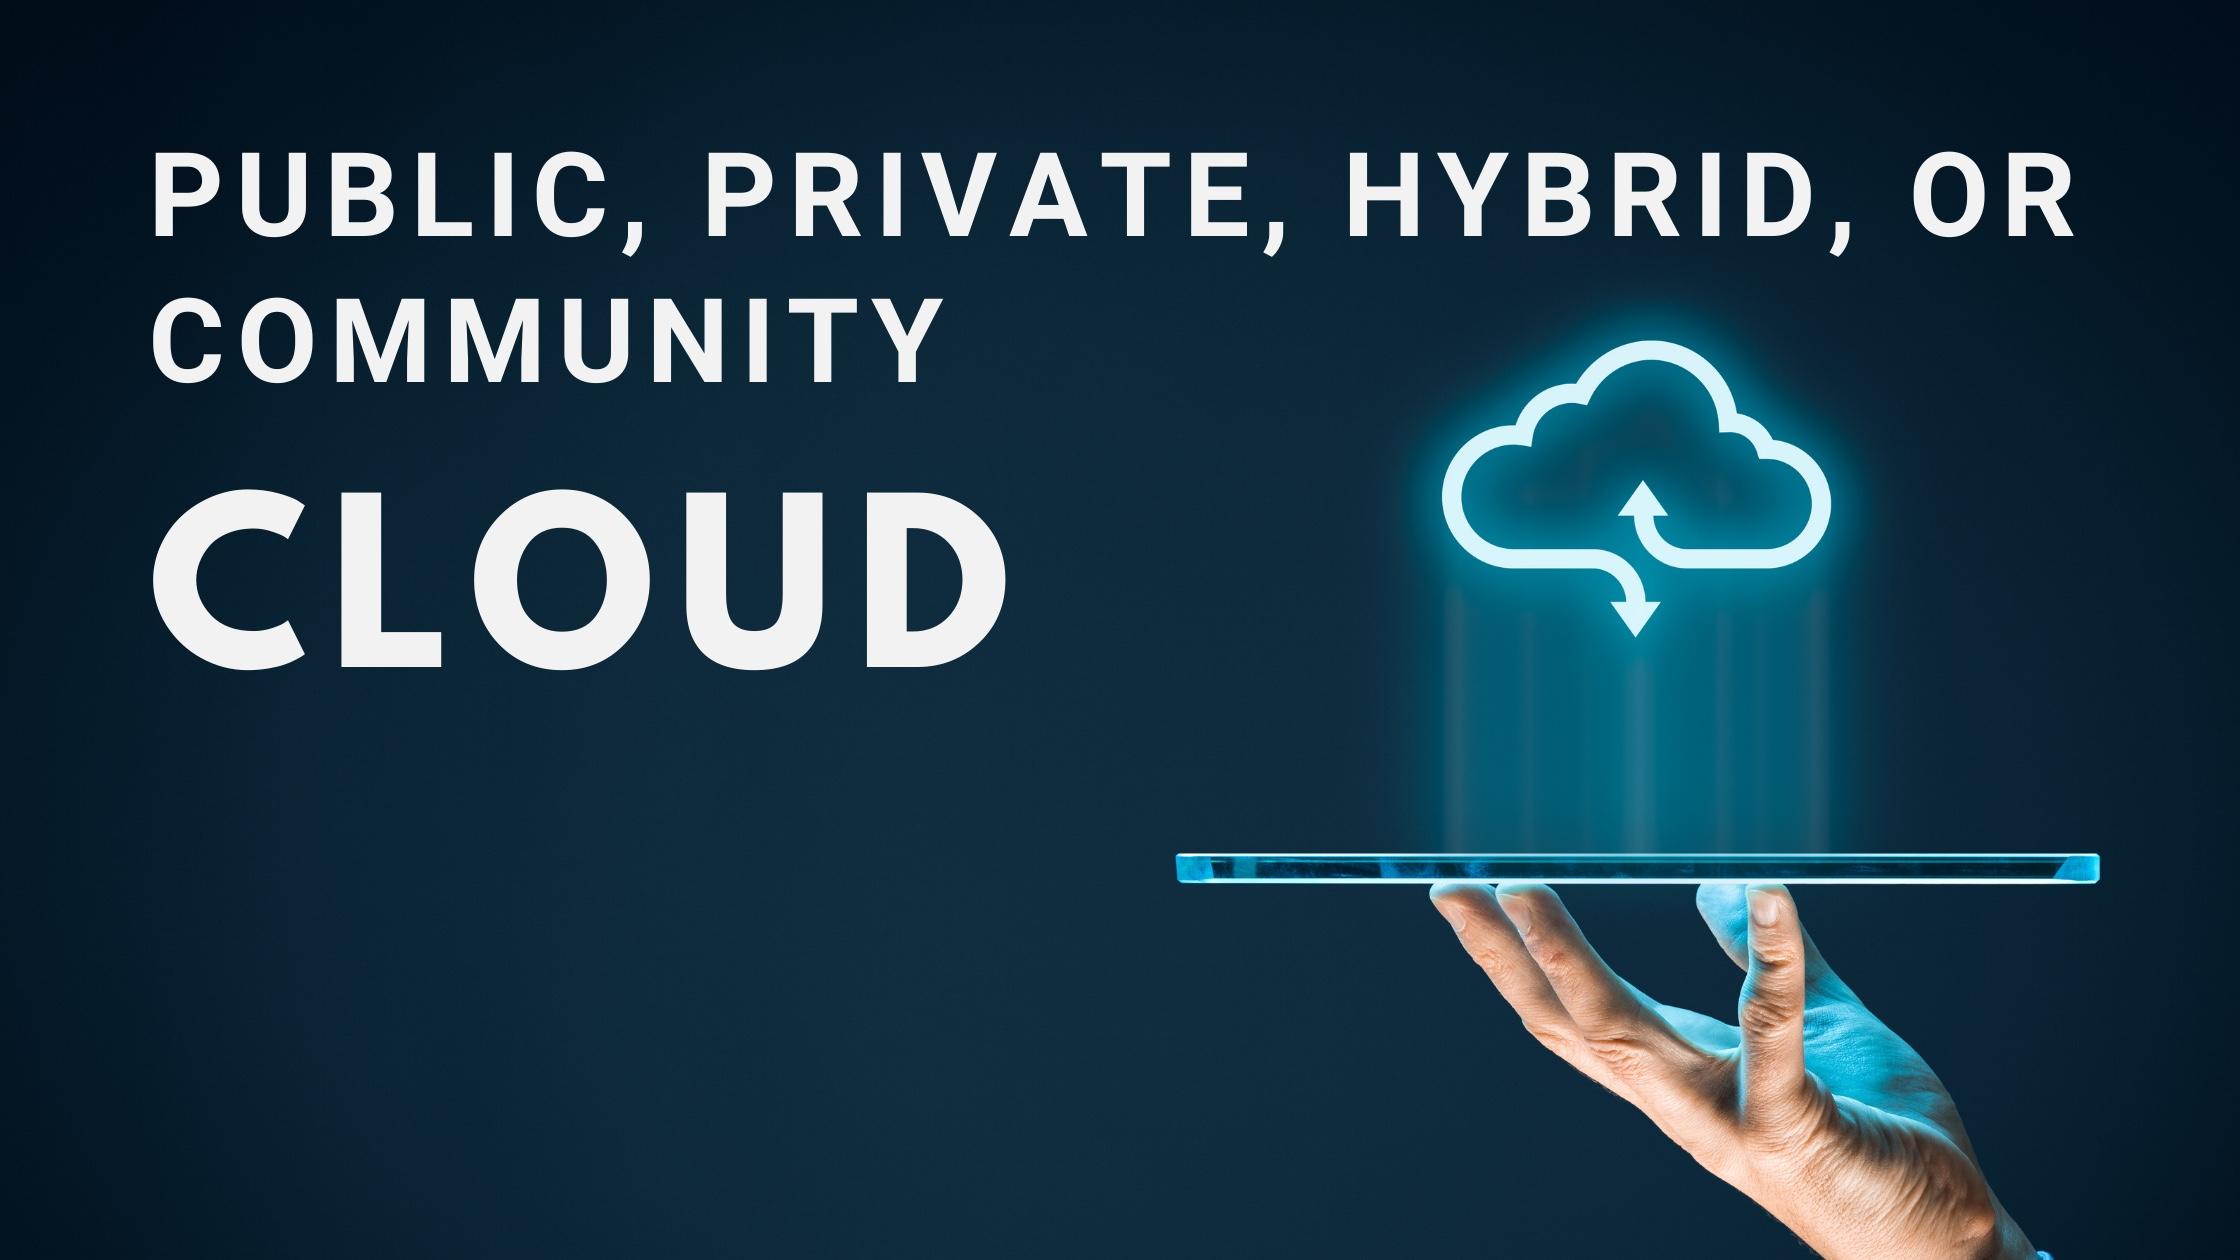 Public, private, community, or hybrid cloud